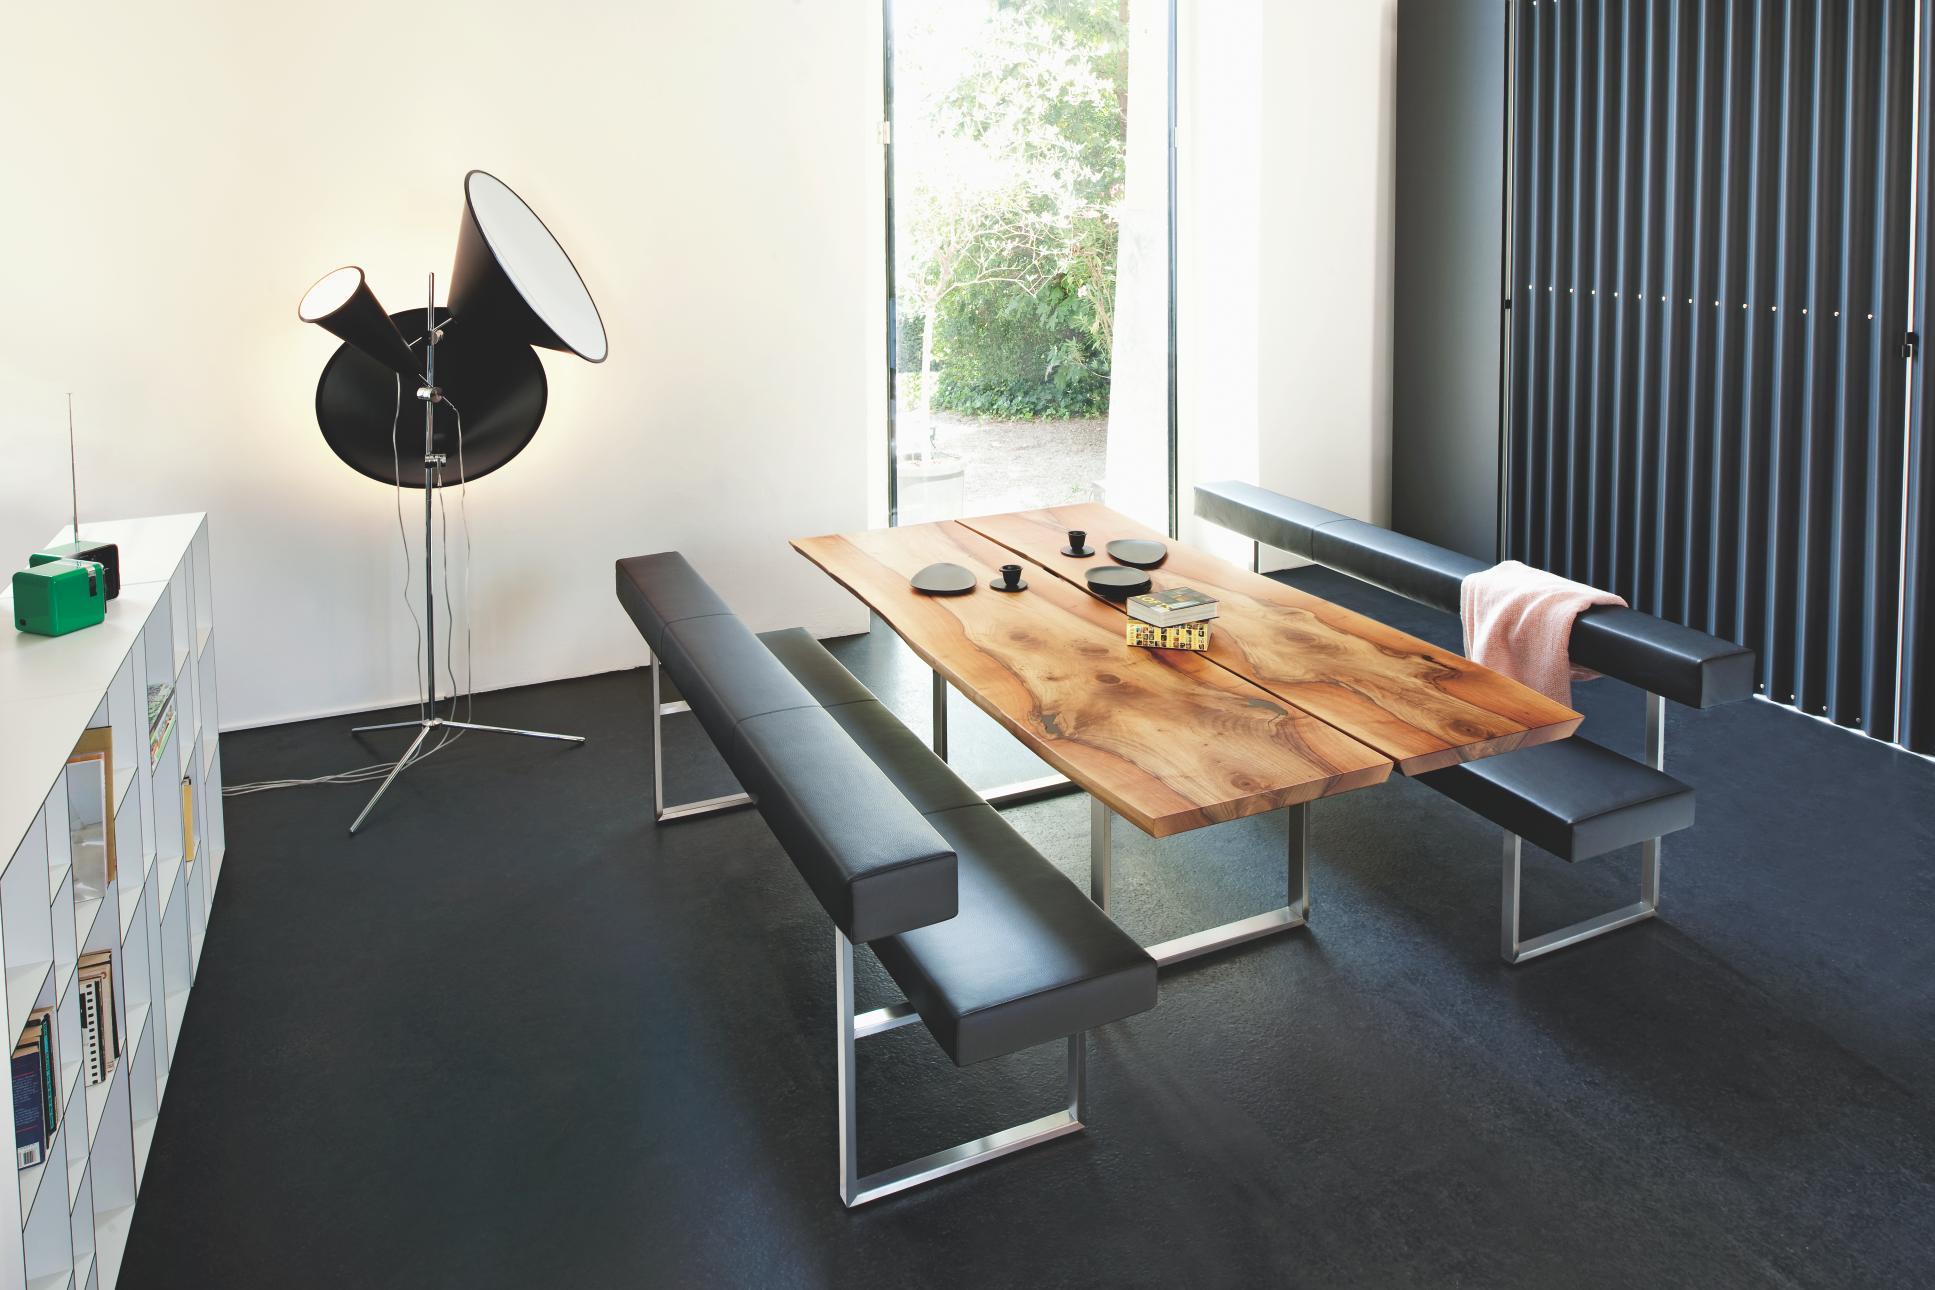 Girsberger – Pfannes & Virnich - Die Wohnberater